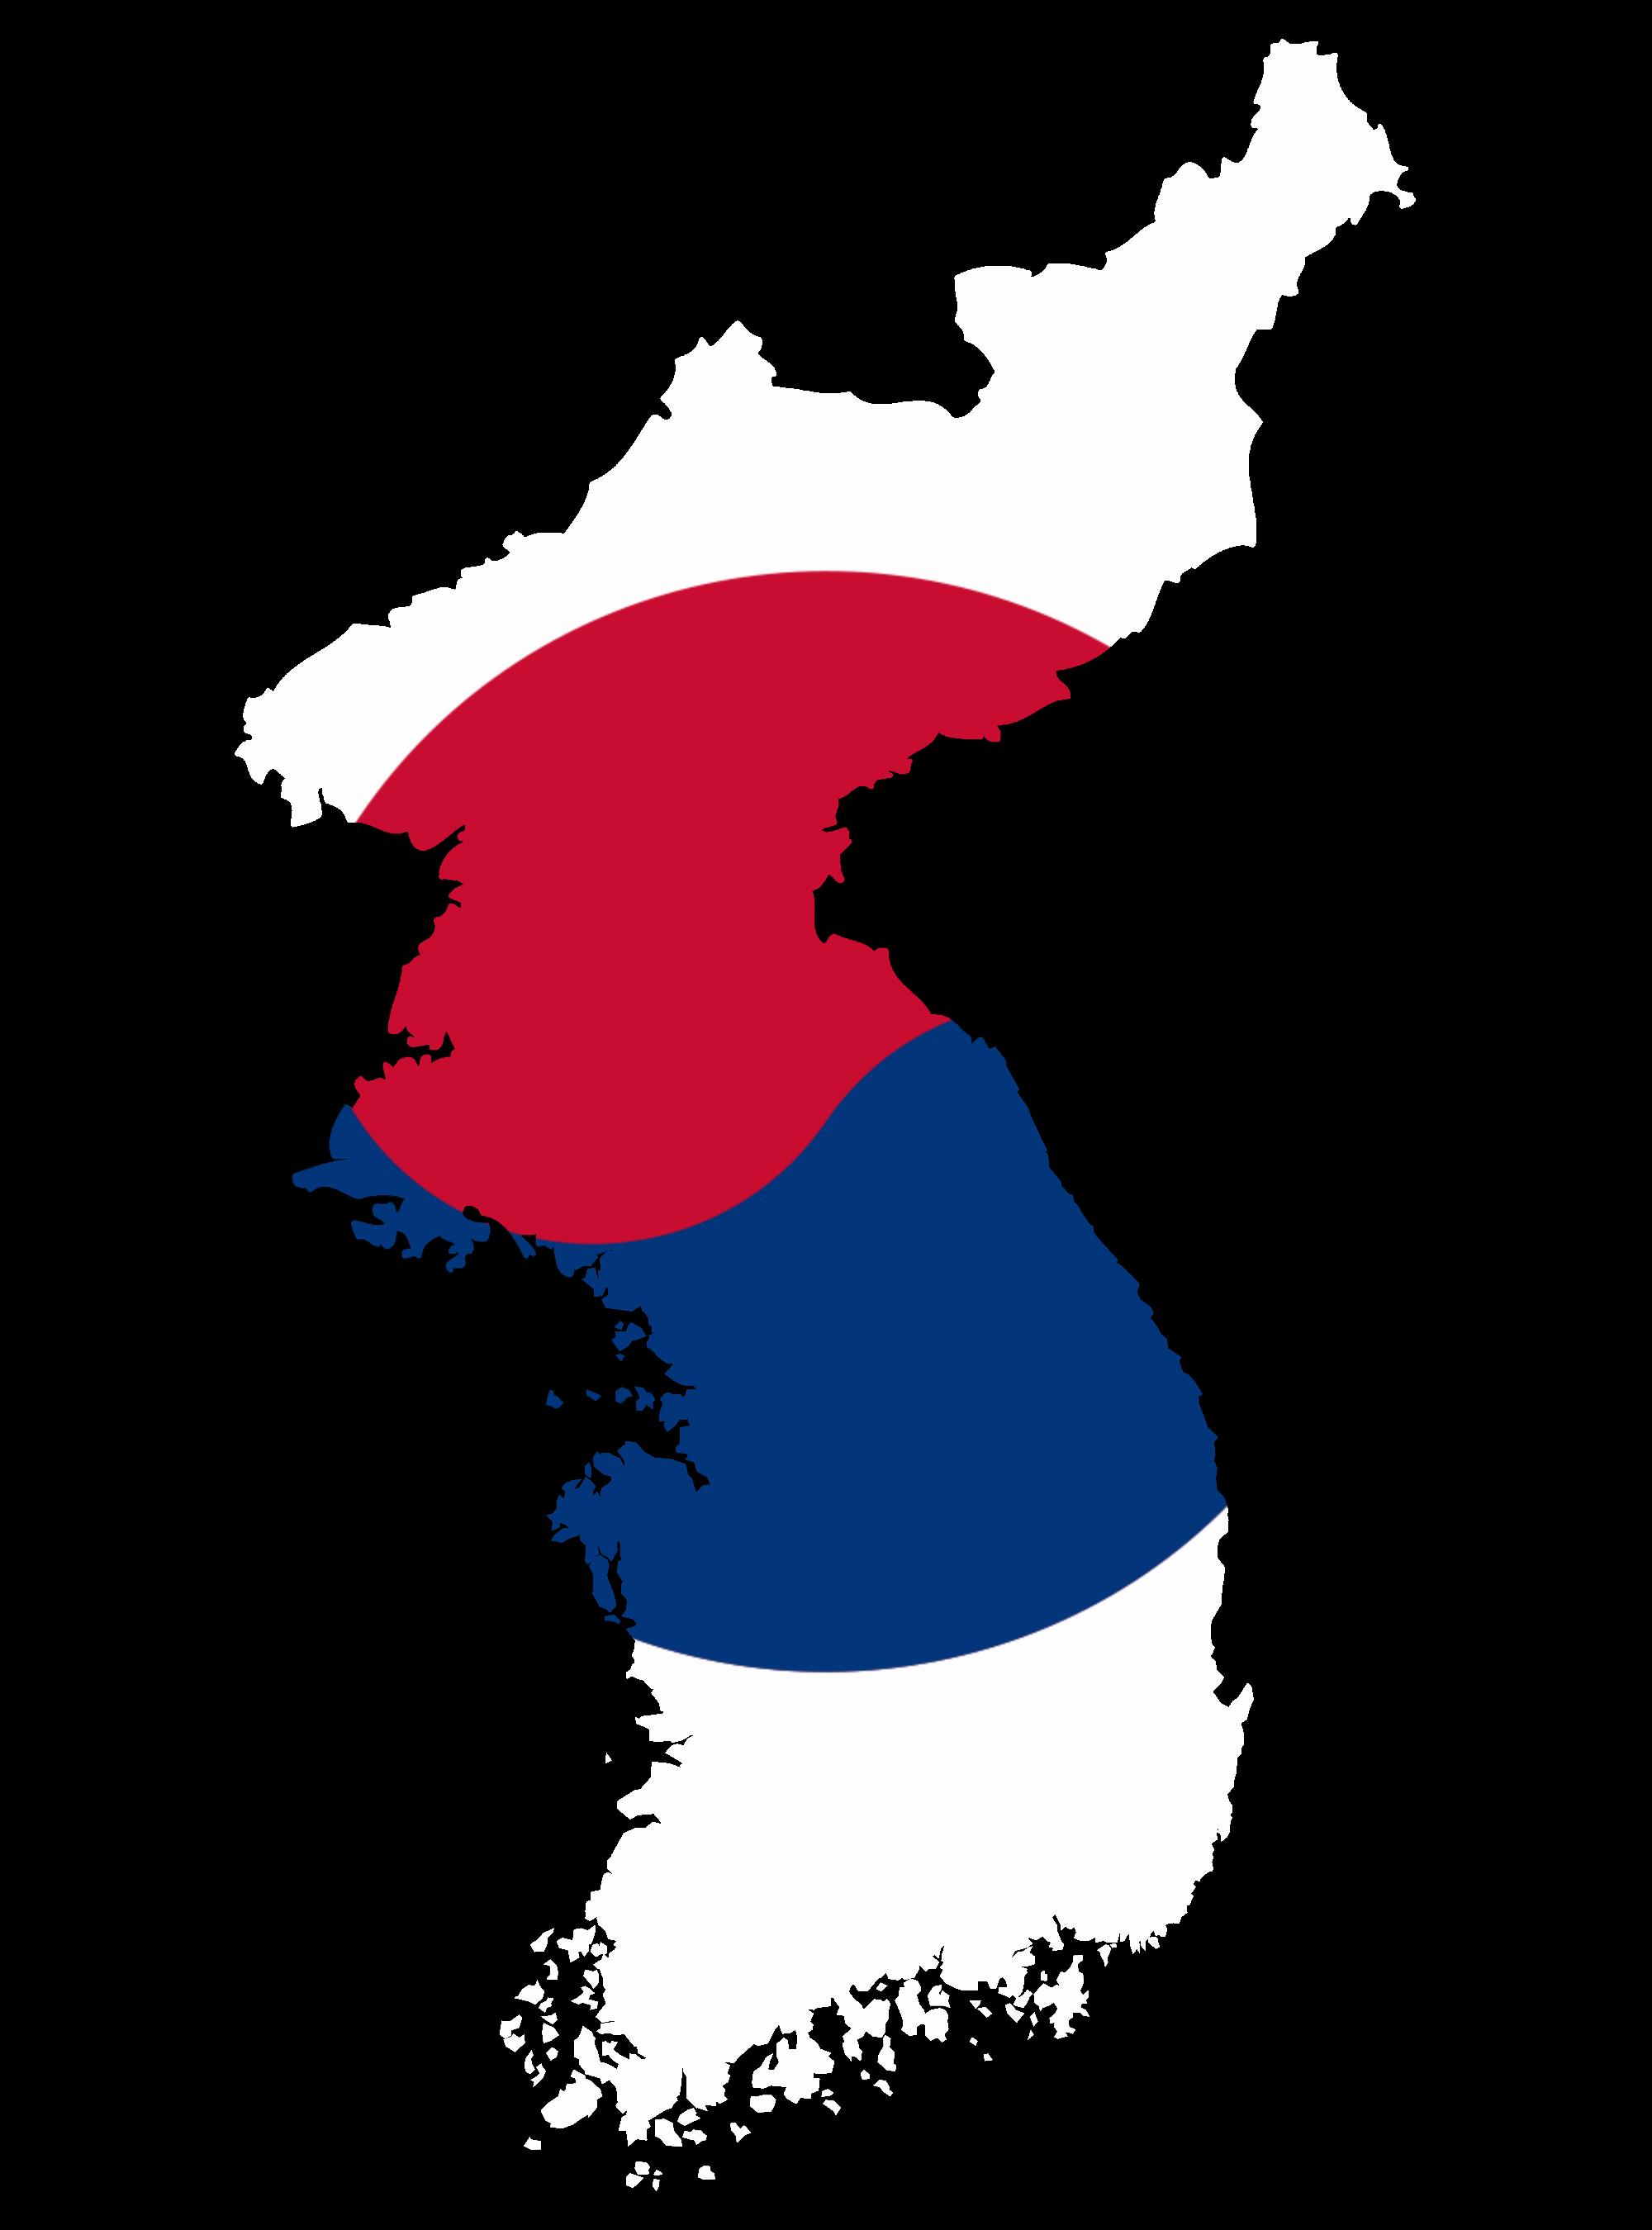 File:flag Map Of Korea (South Korea).png - Korea, Transparent background PNG HD thumbnail